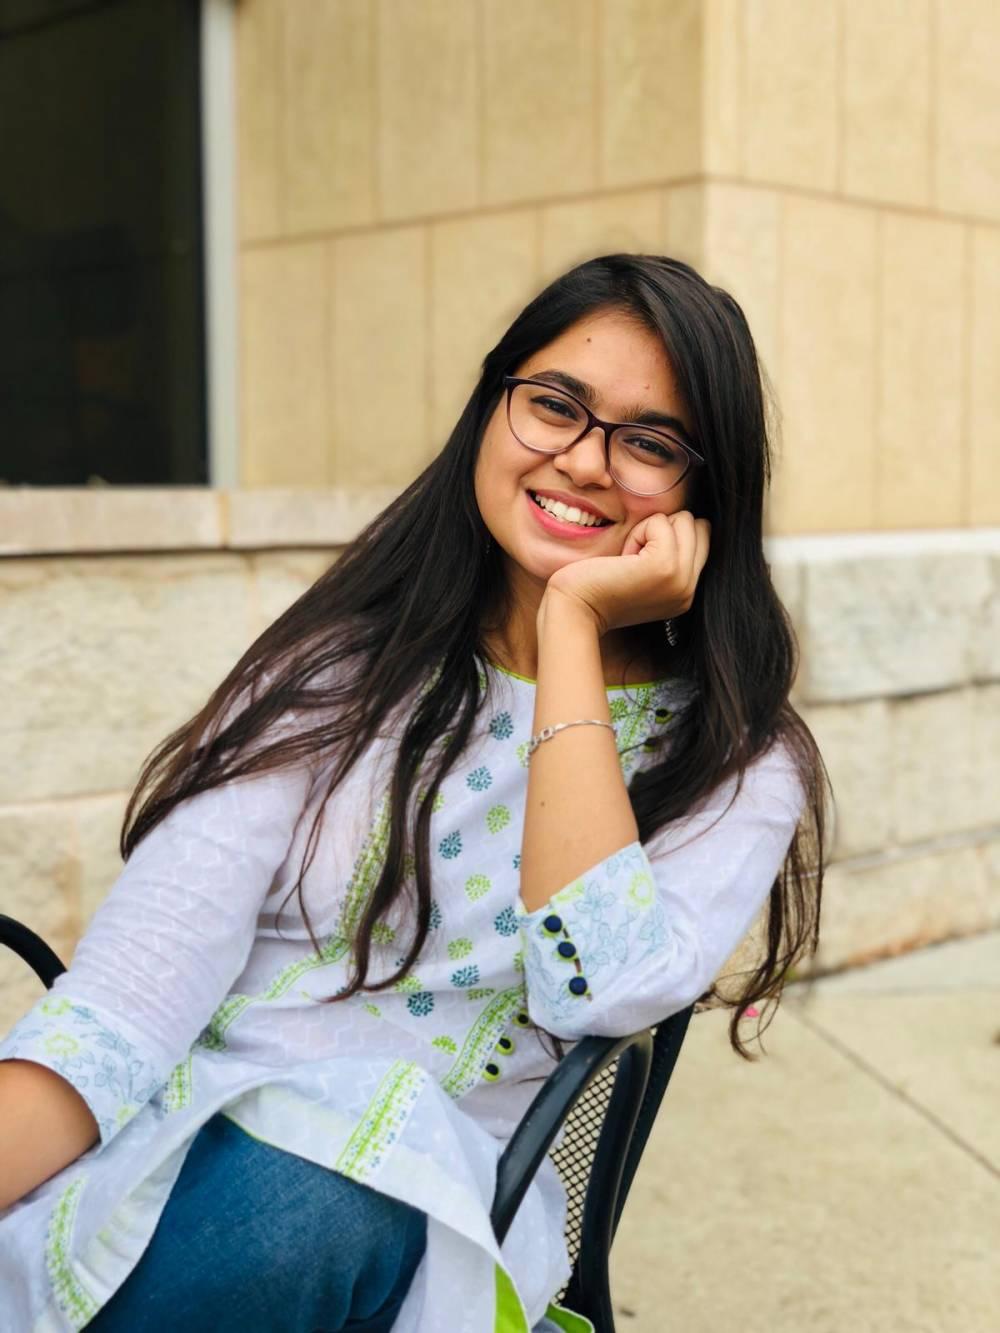 Rutgers news, Rutgers Today - Anusha Gupta, RU-FIT